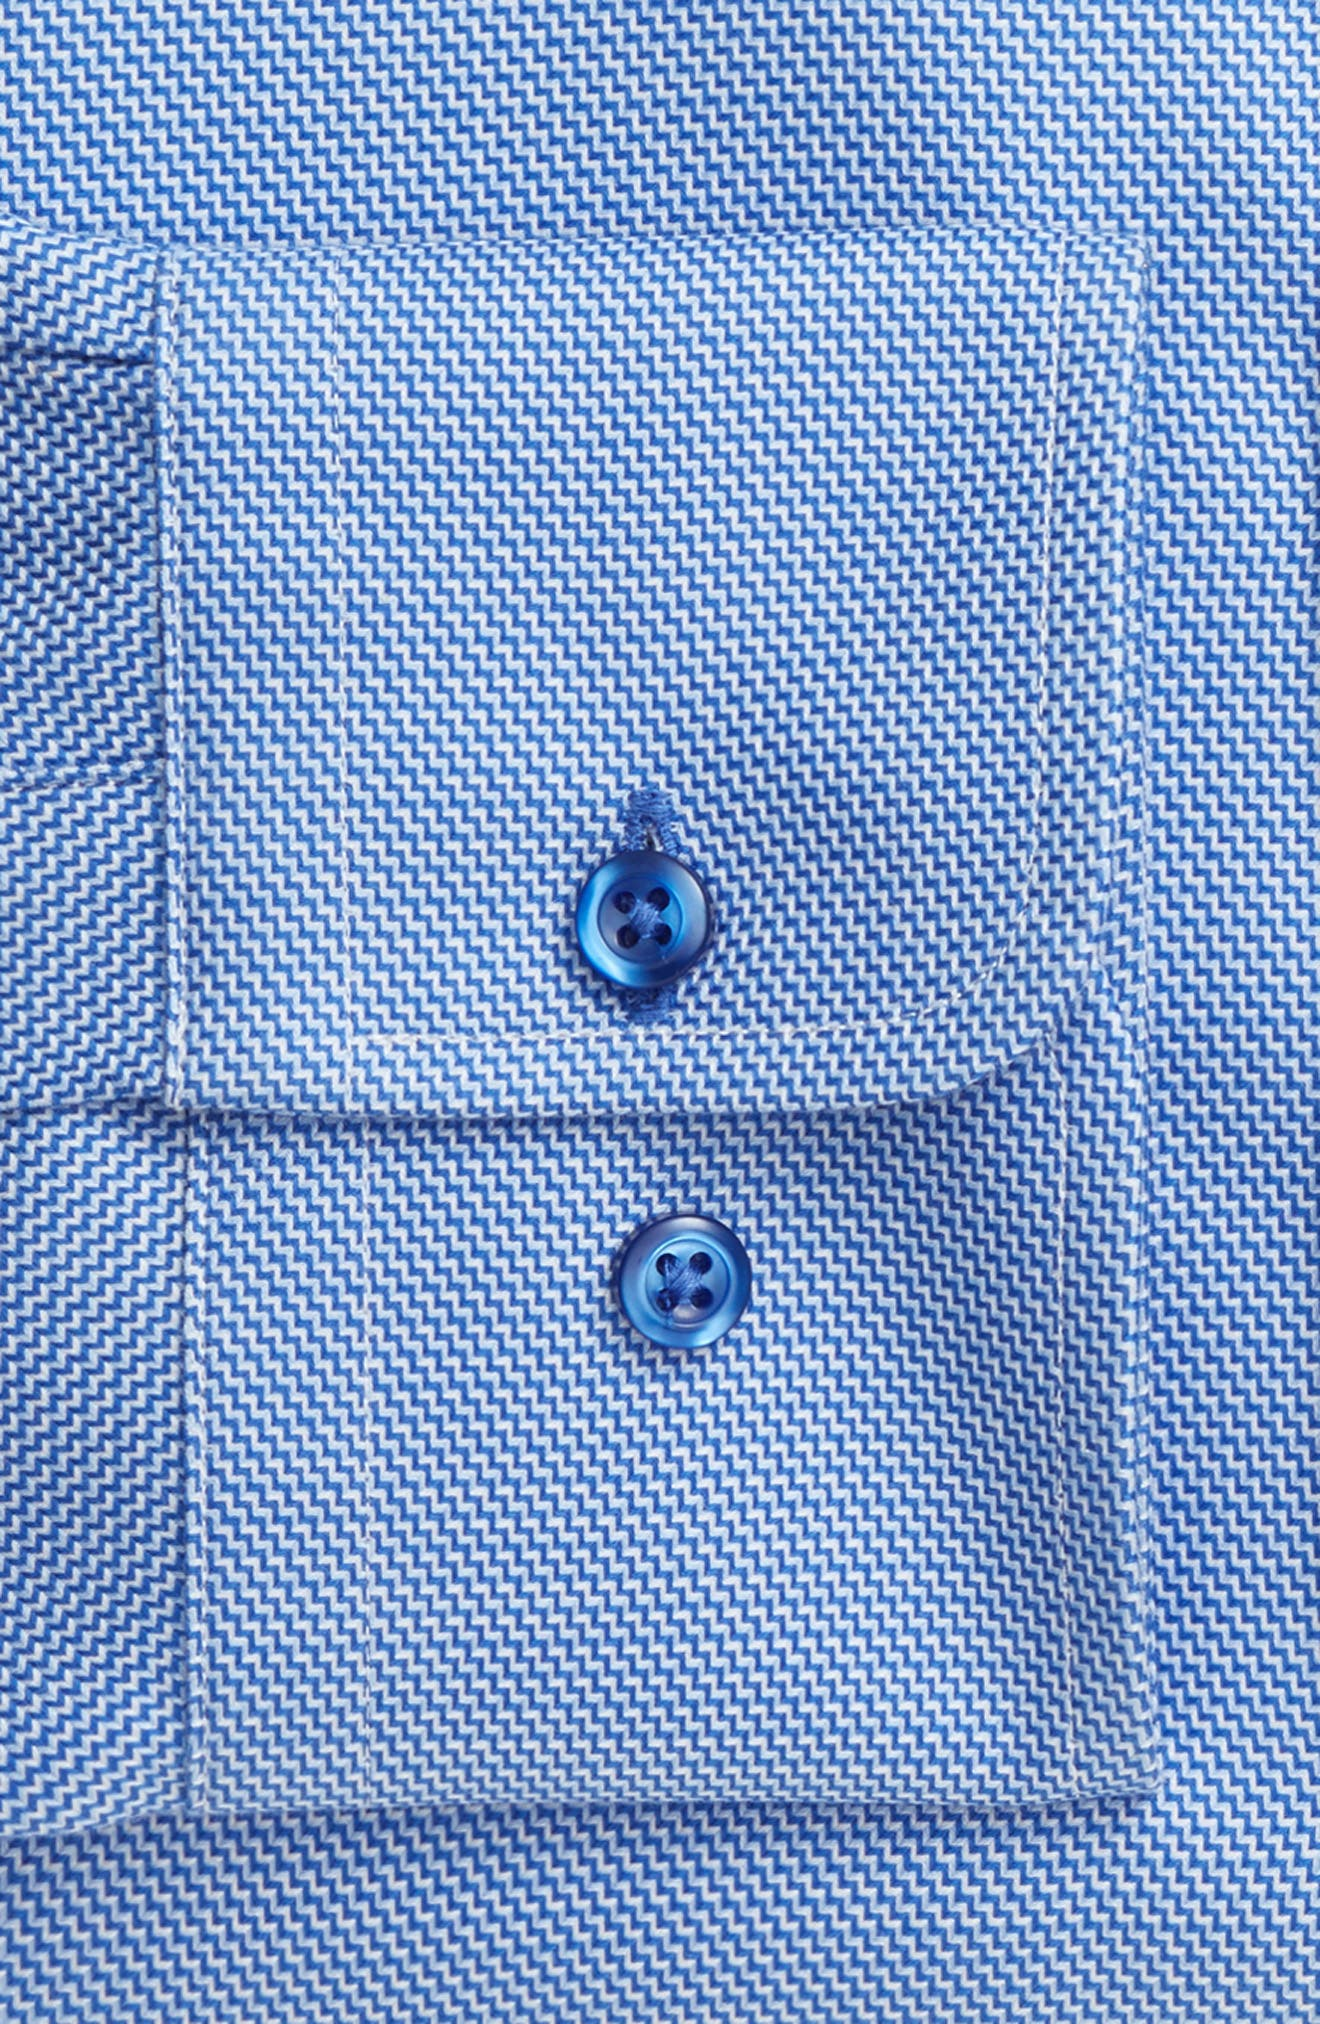 Slim Fit Solid Dress Shirt,                             Alternate thumbnail 5, color,                             Blue